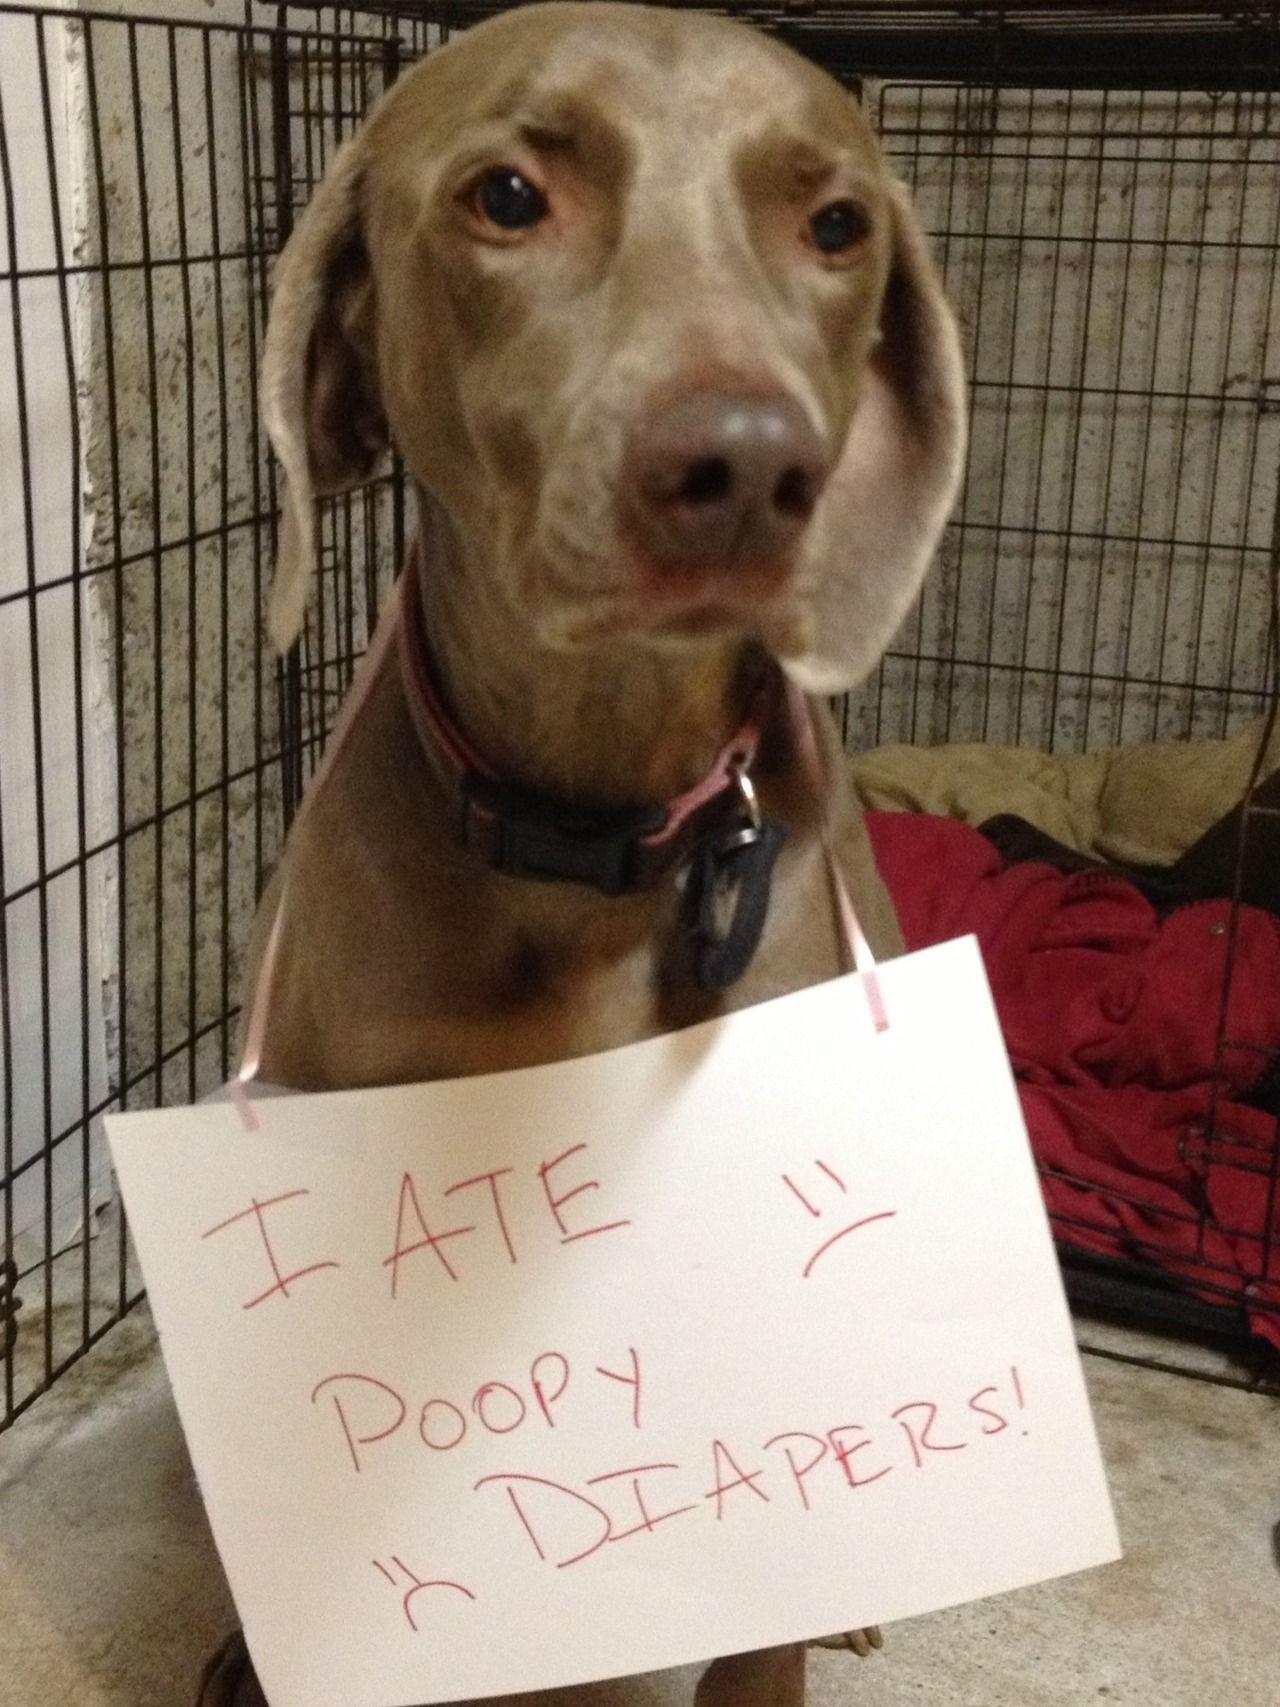 I Ate Poopy Diapers Dog Shaming Funny Animal Shaming Dog Shaming